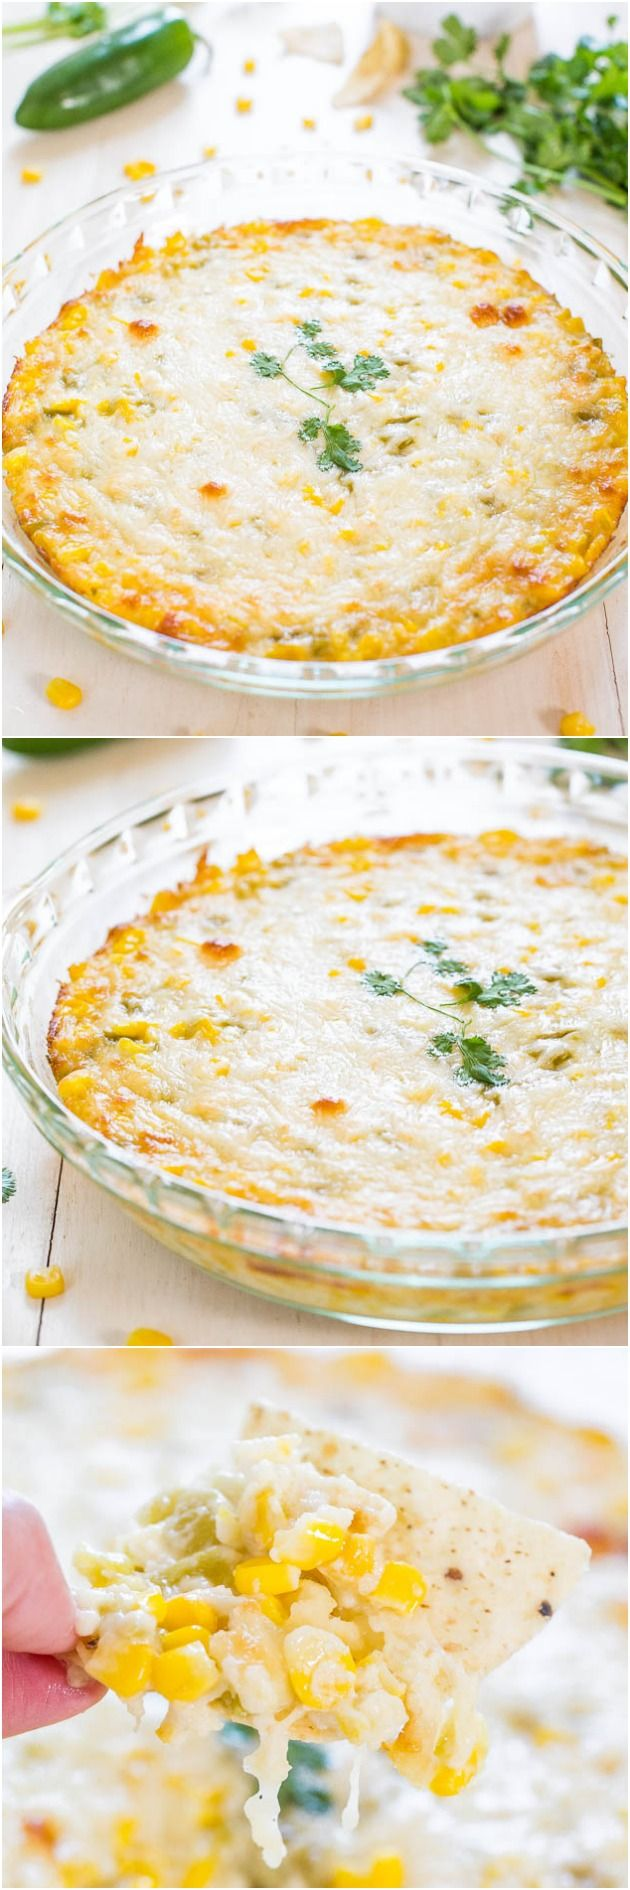 Hot Cheesy Corn Dip -